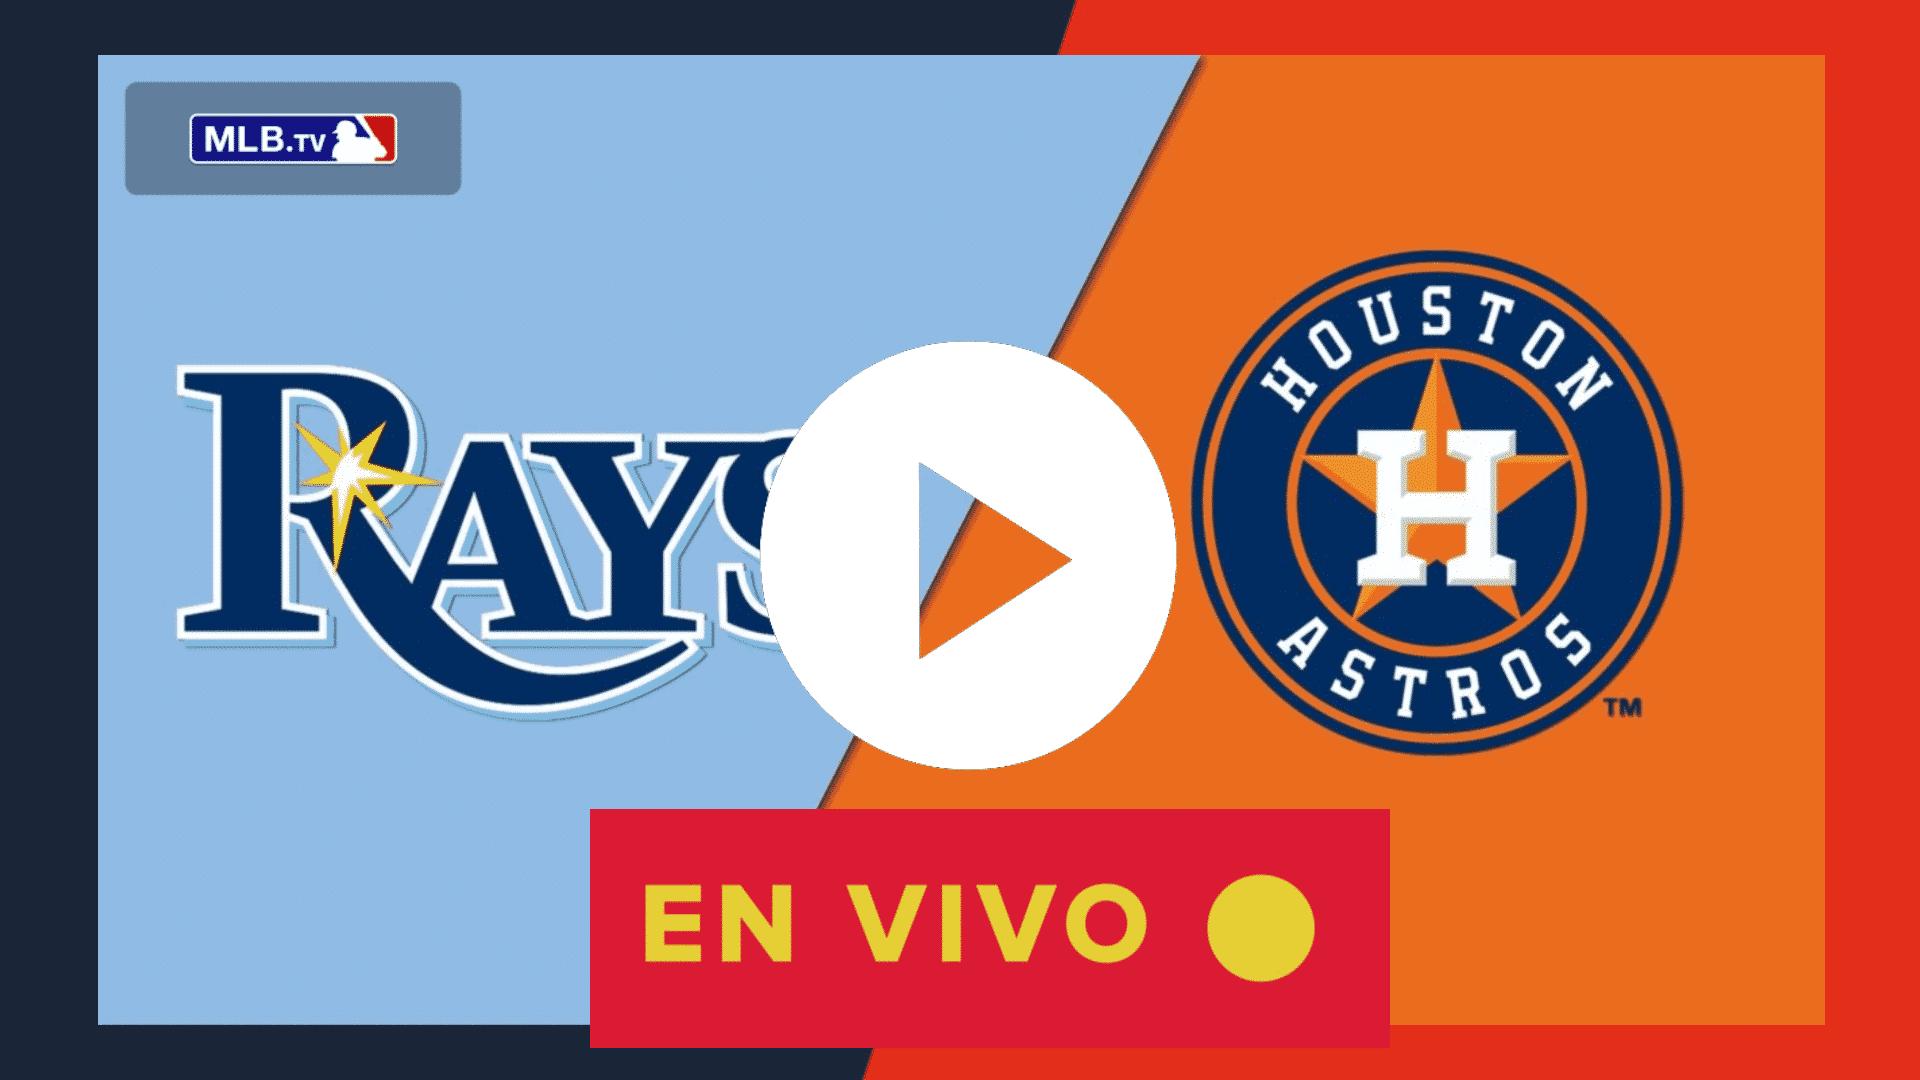 AQUI HOY EN VIVO Rays vs Astros EN DIRECTO MLB EN VIVO TV GRATIS